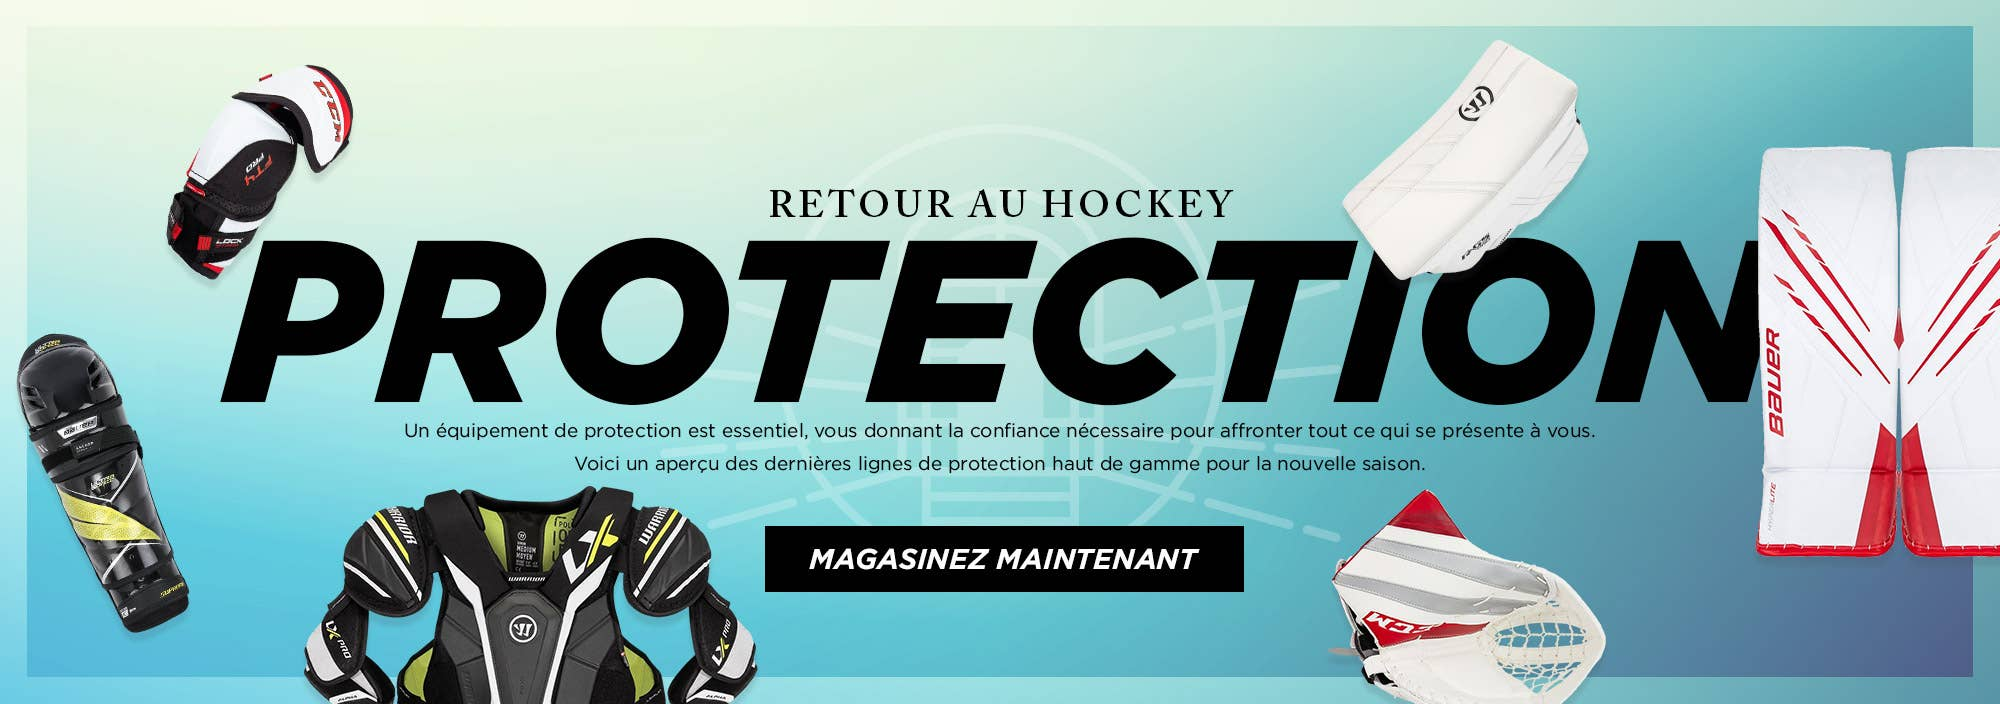 Retour au Hockey: Protection